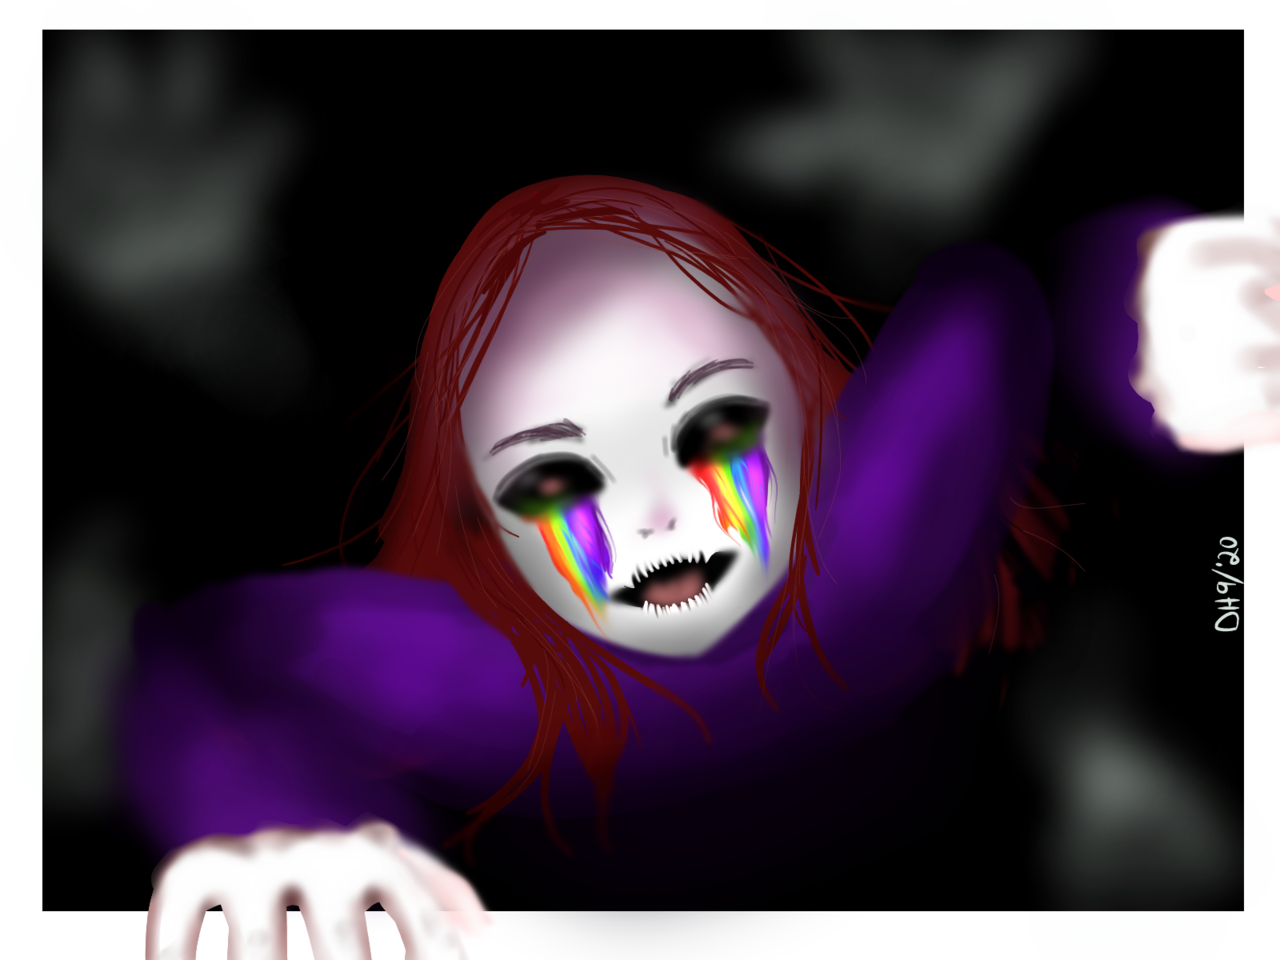 for Emo_weeb888 Illust of DanDraw medibangpaint Creepypasta oc